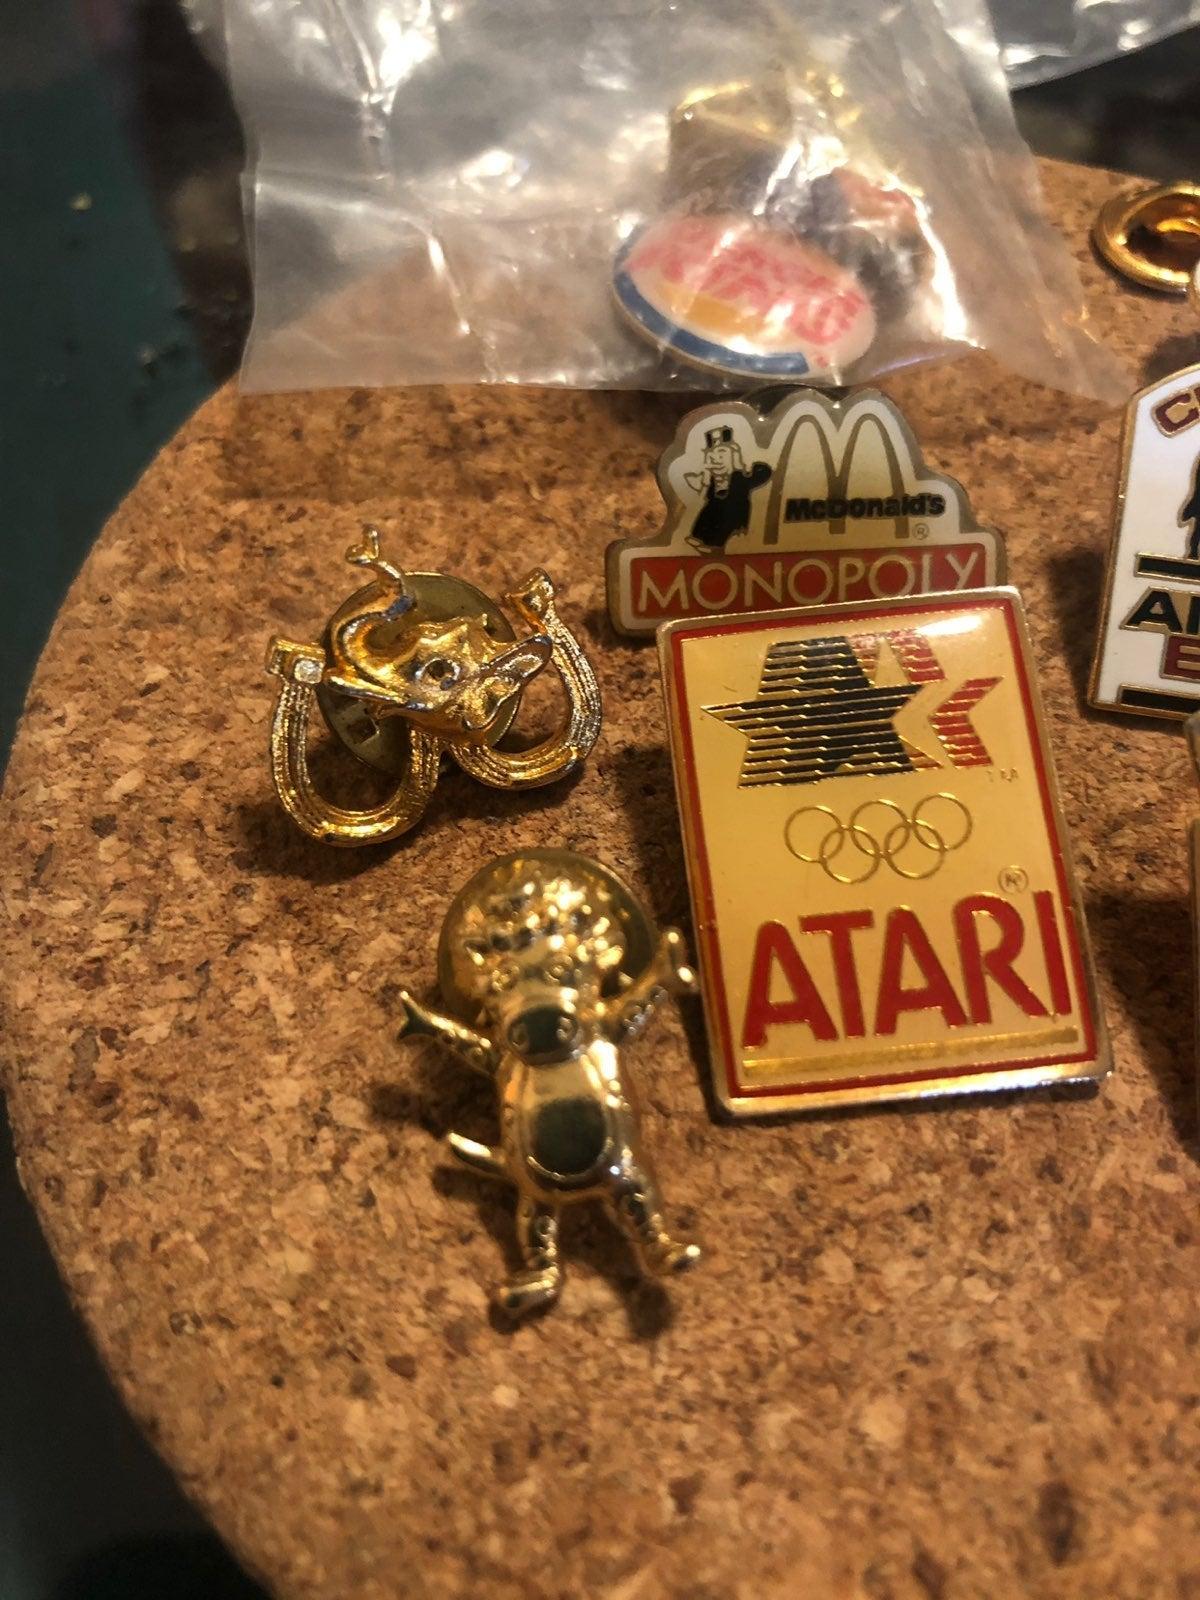 Atari McDonald's Baby Bop Monopoly Pins